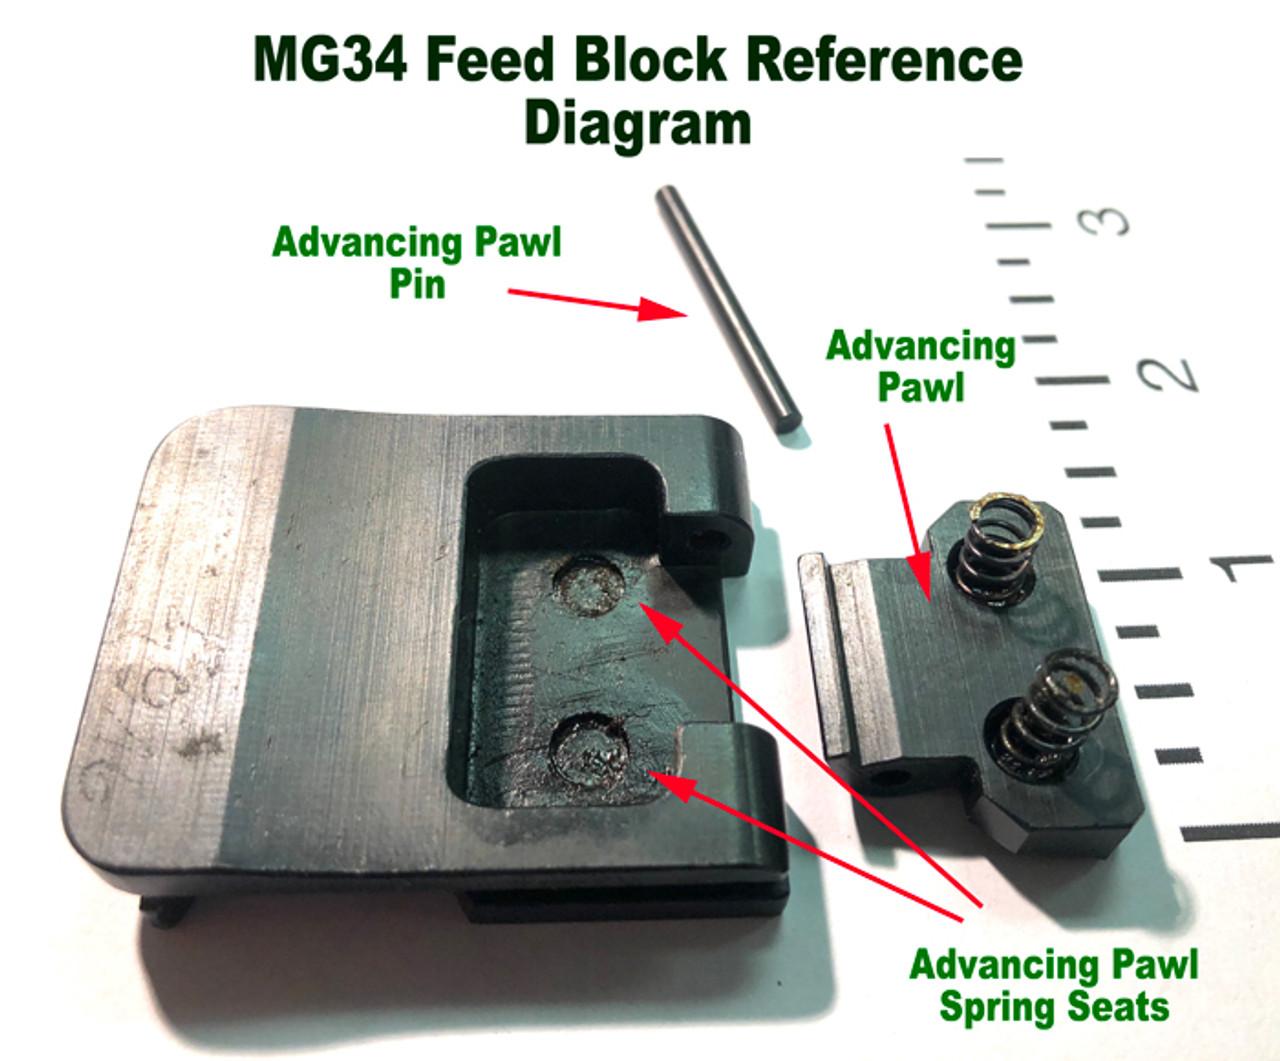 MG34 Top Advancing Pawl Spring